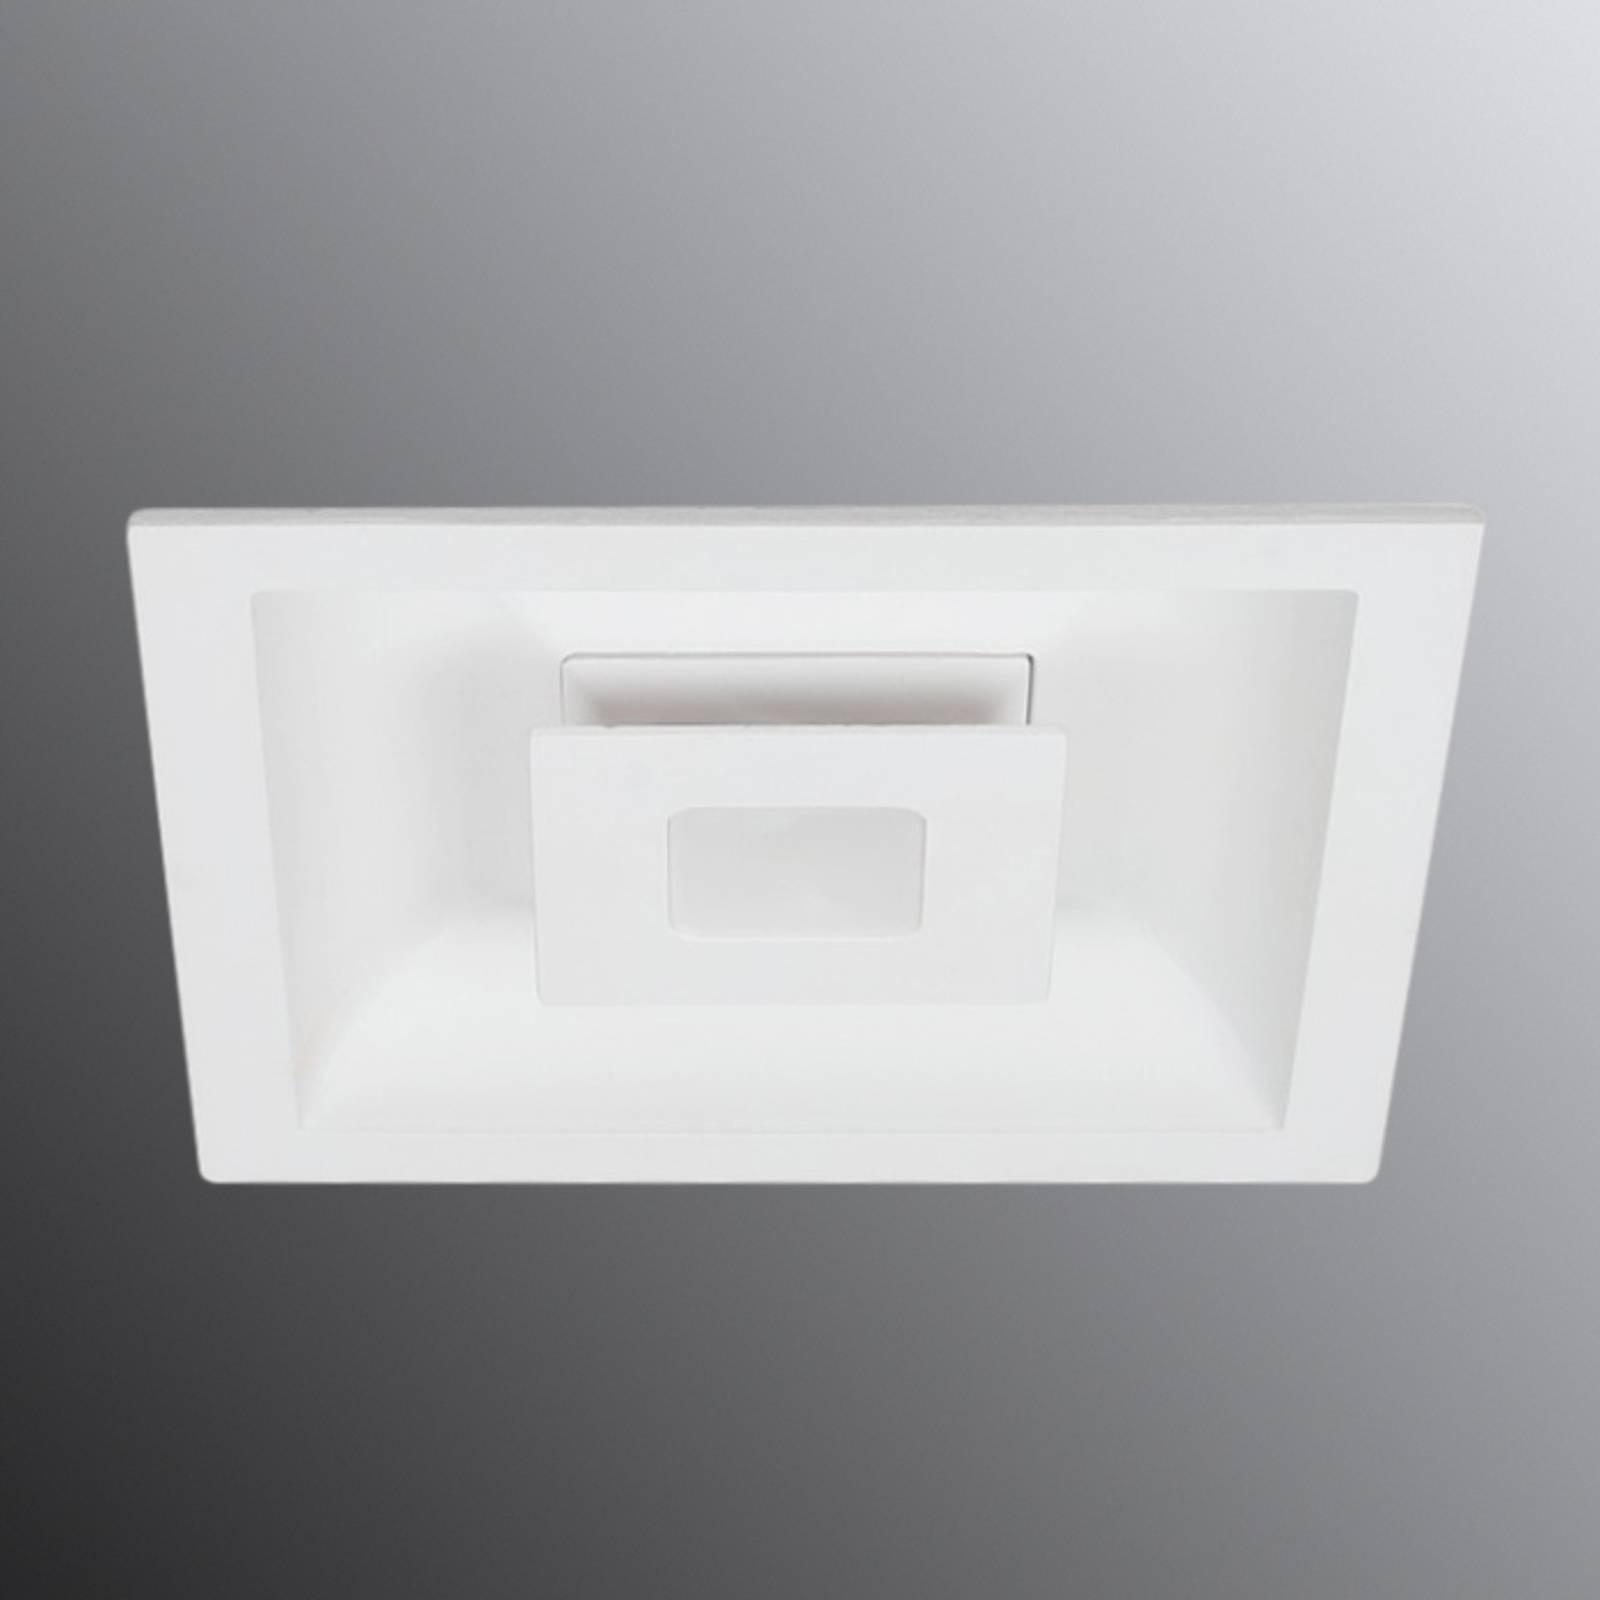 Lampa sufitowa wpuszczana LED Eclipse, 2 LED